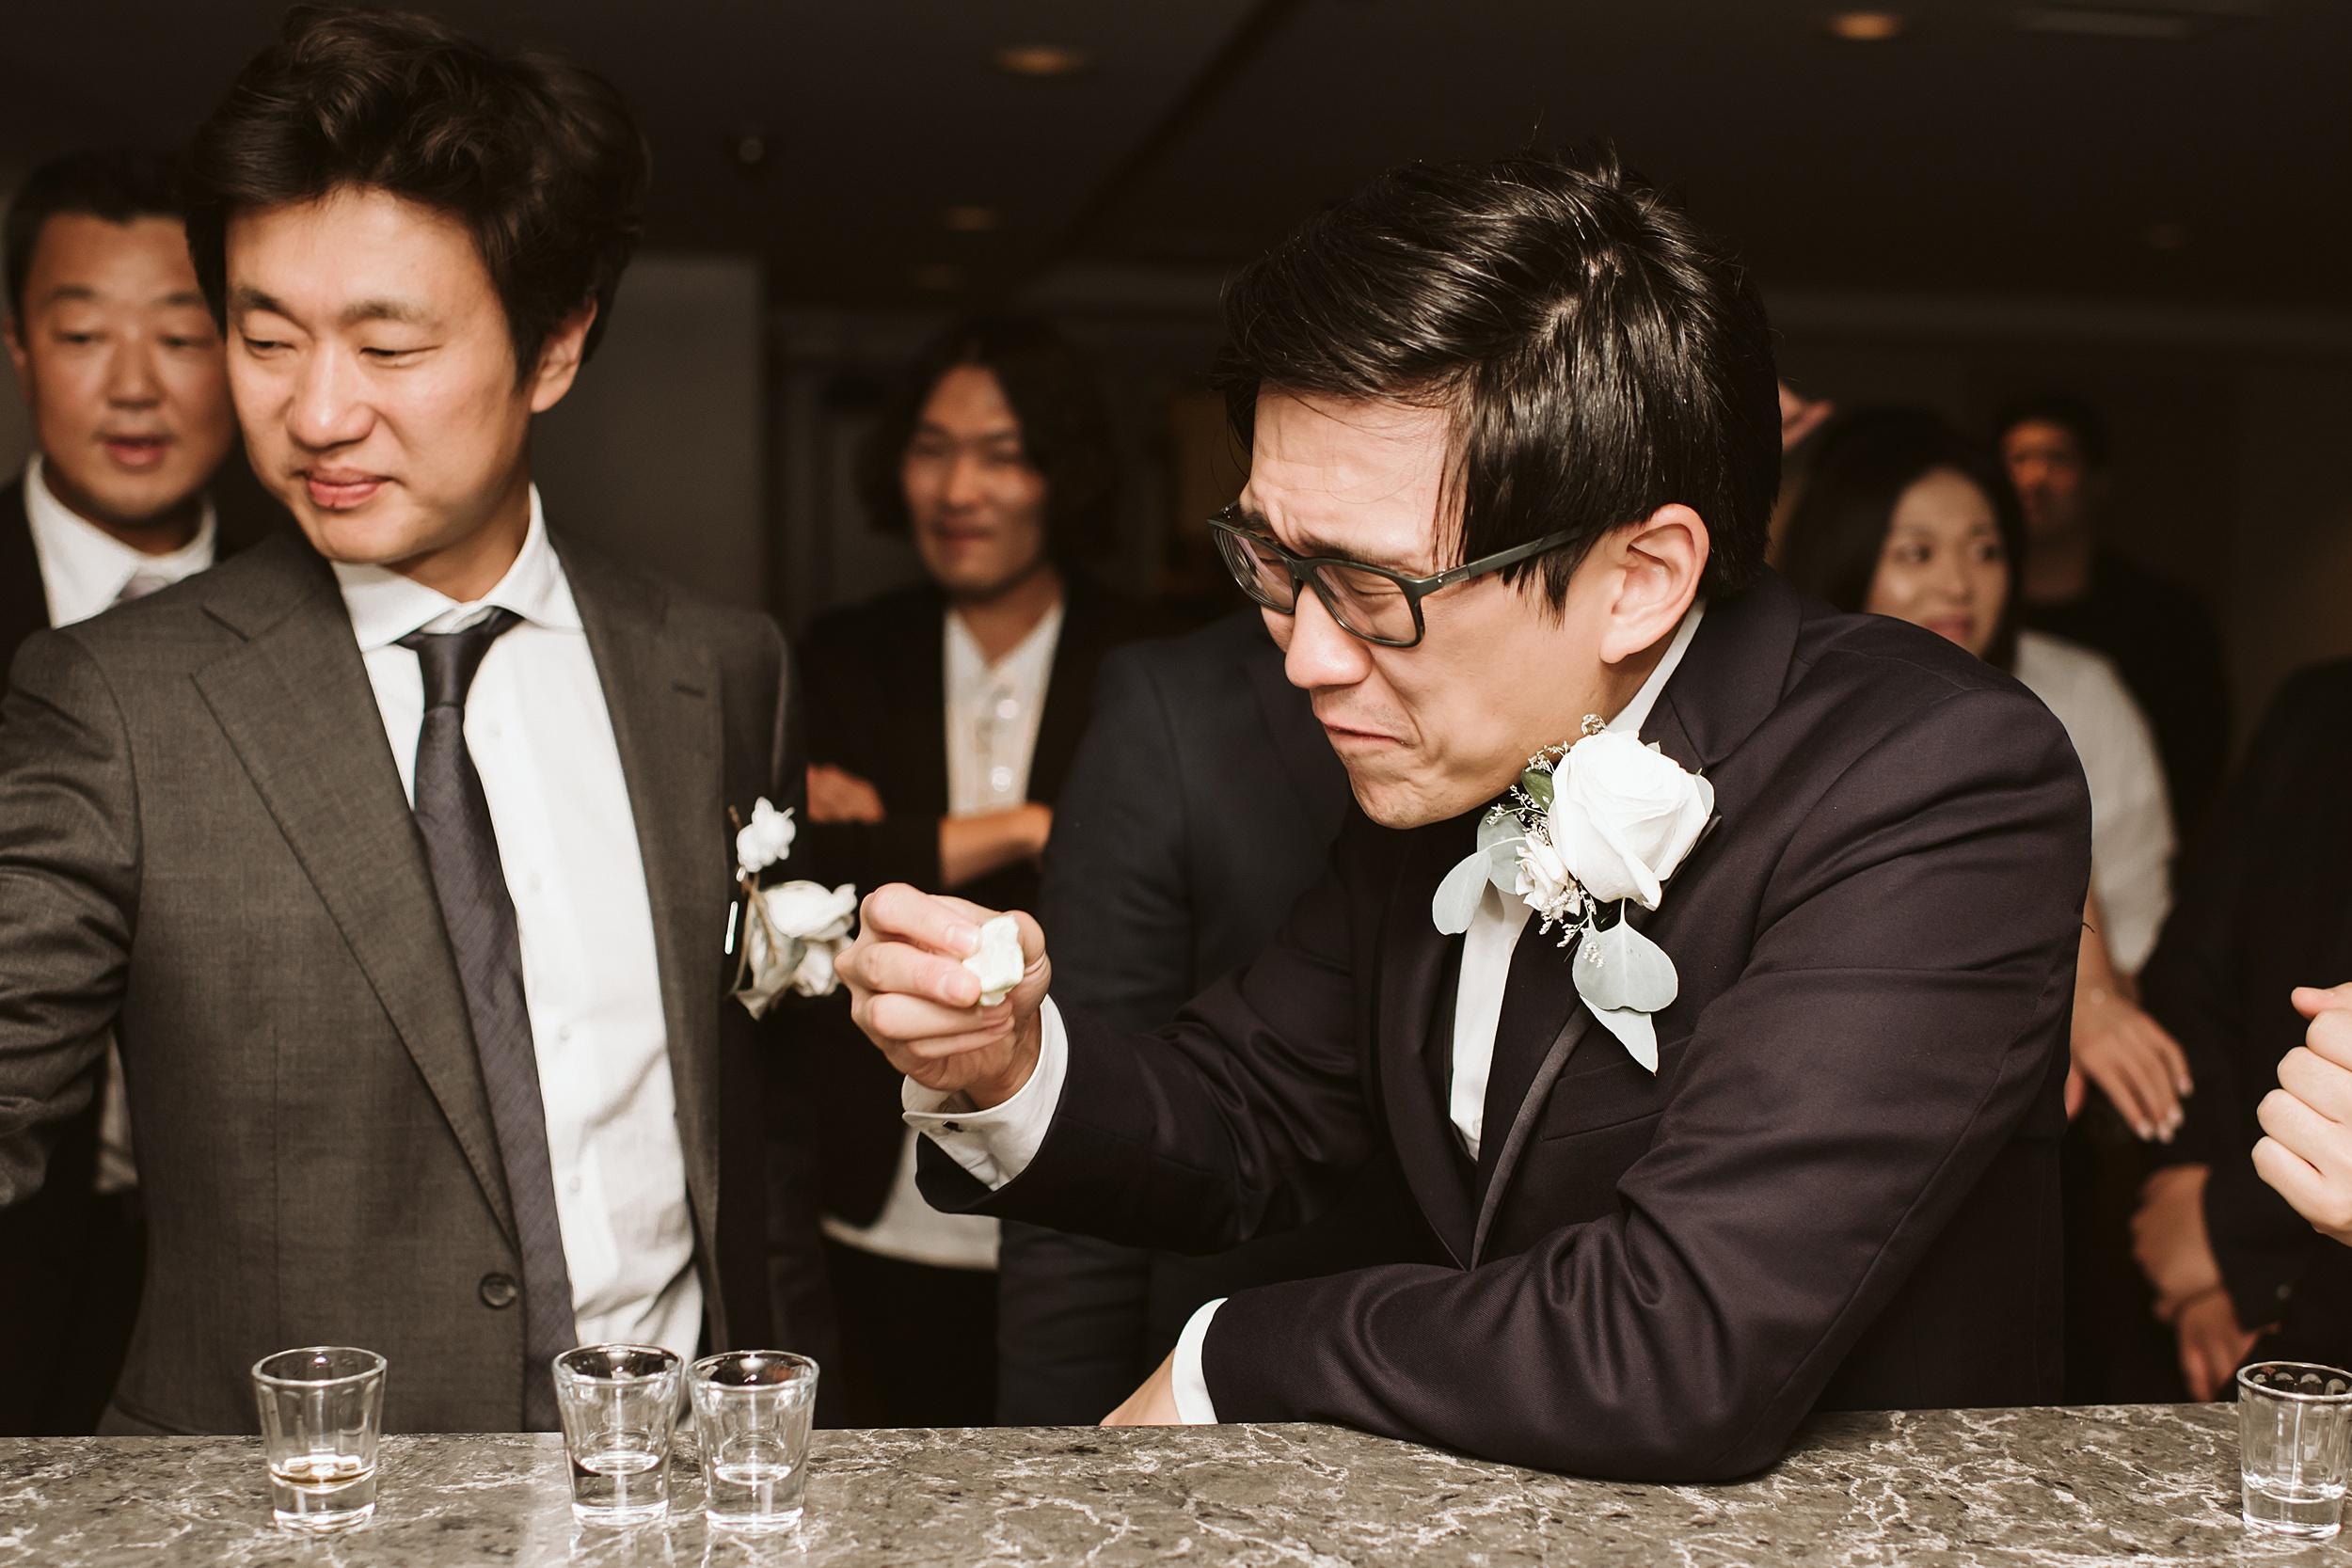 Doctors_House_Kleinburg_Wedding_Toronto_Photographer_0094.jpg